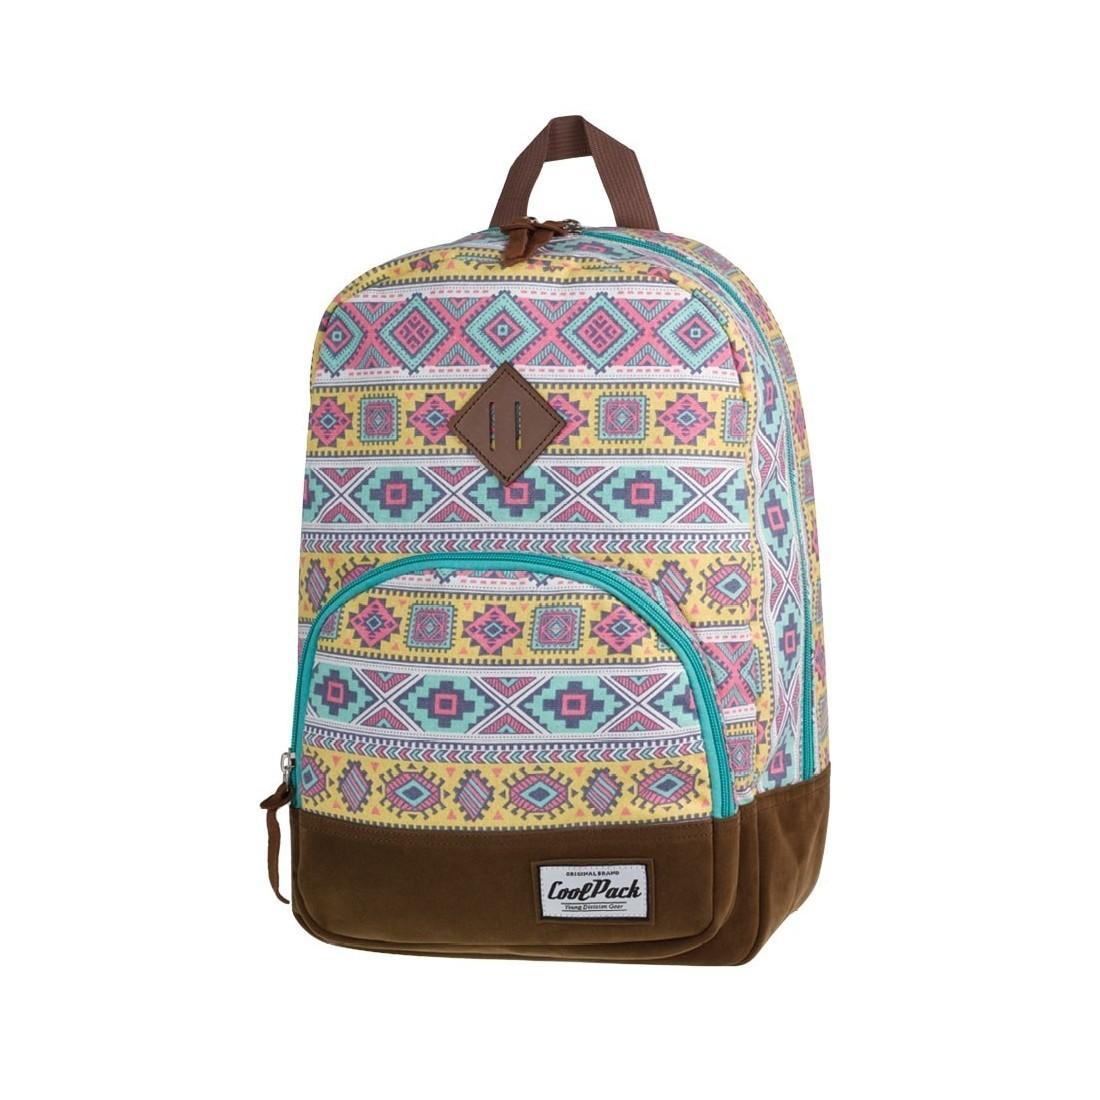 ed5a80e8cd049 Plecak miejski CoolPack CP retro kolorowy Aztec CLASSIC AZTEC 1011 ...